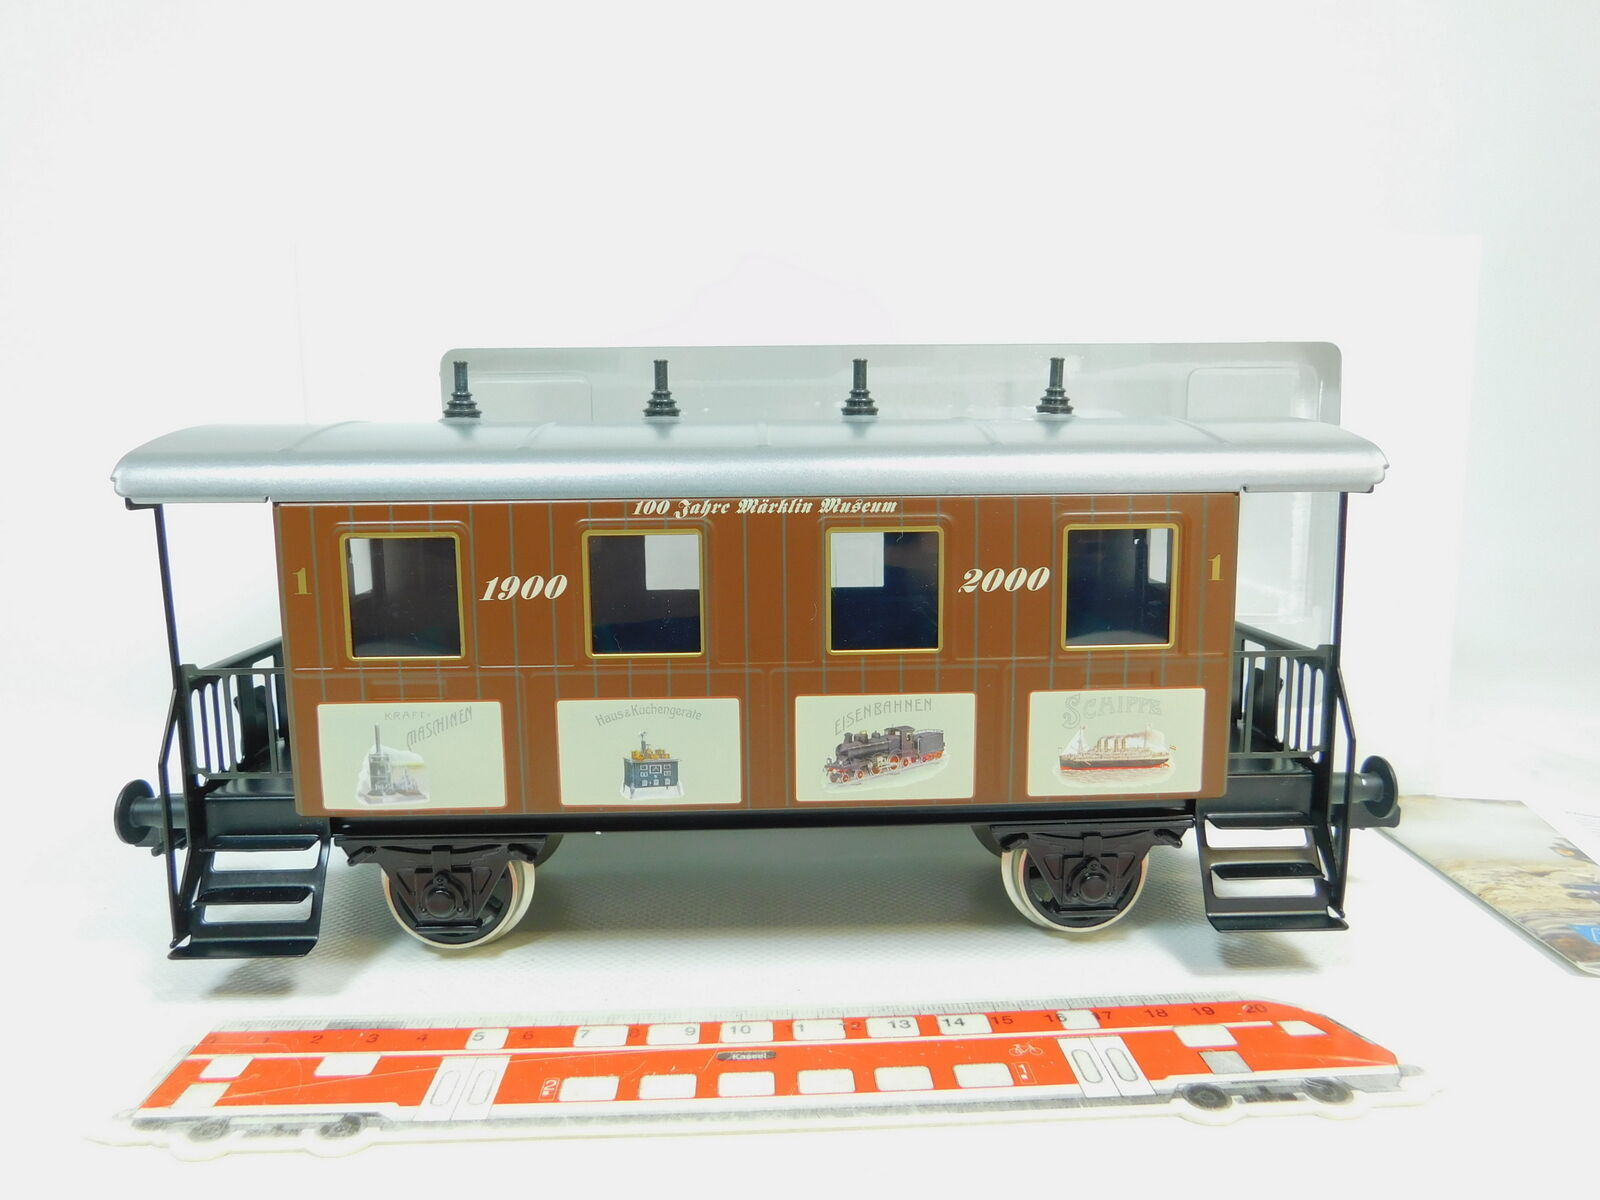 Bo243-2 marklin scale 1 AC 54708 wagons 1900 2000 100 years, new + ovp